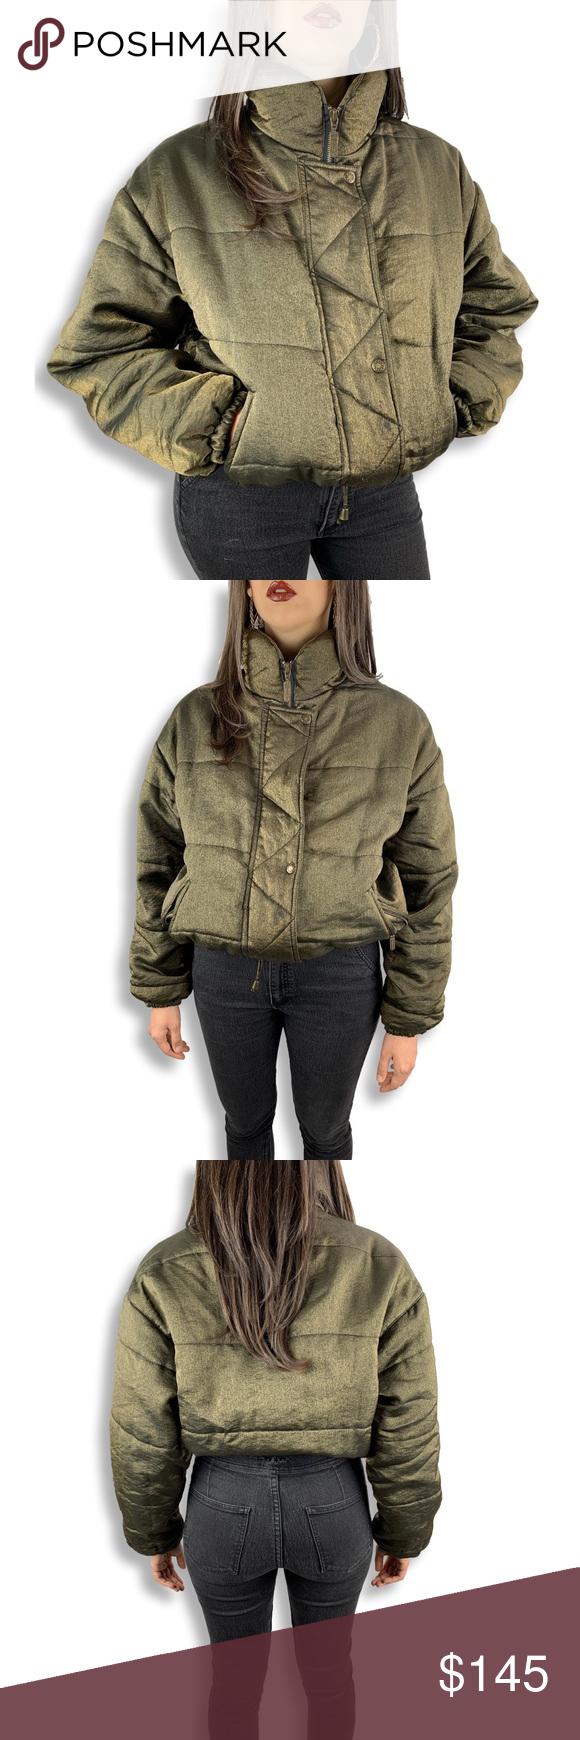 Sold Vtg Metallic Gold Green Jacket By Izzi Clothes Design Puffy Jacket Fashion [ 1740 x 580 Pixel ]